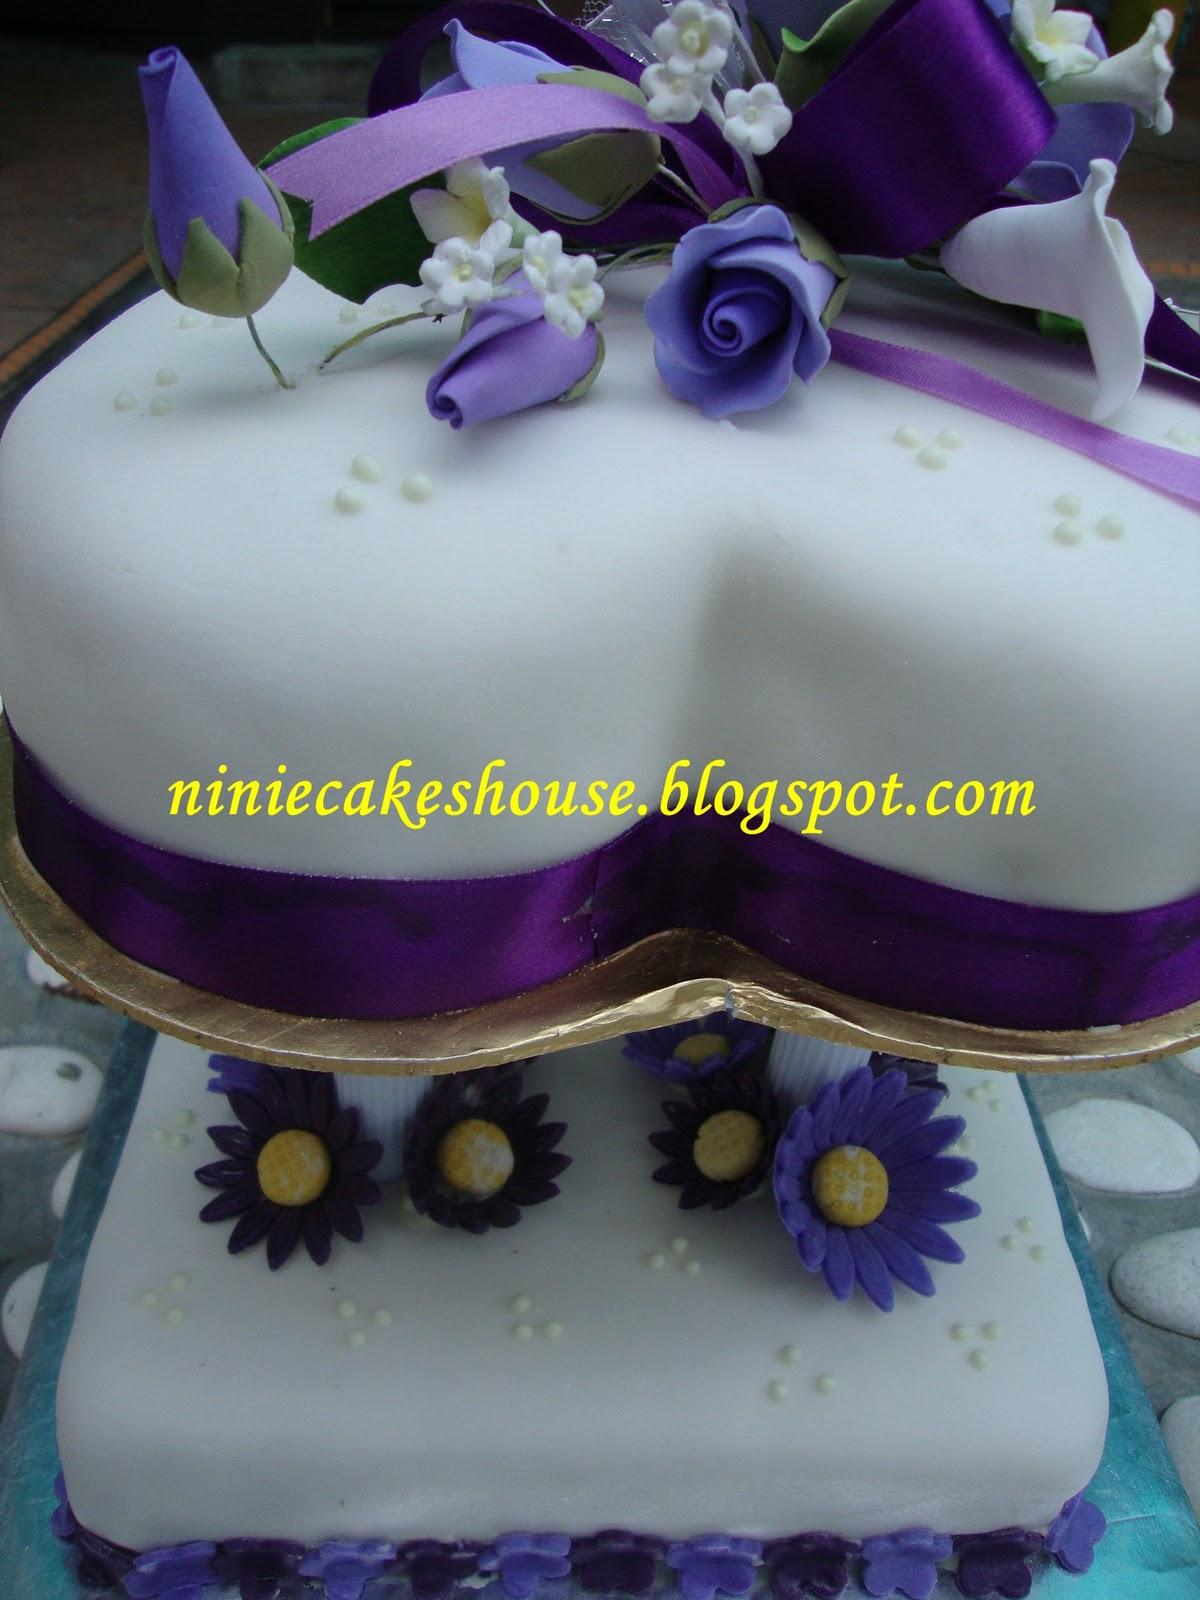 ninie cakes house 2 tier Wedding Cakes Purple and White